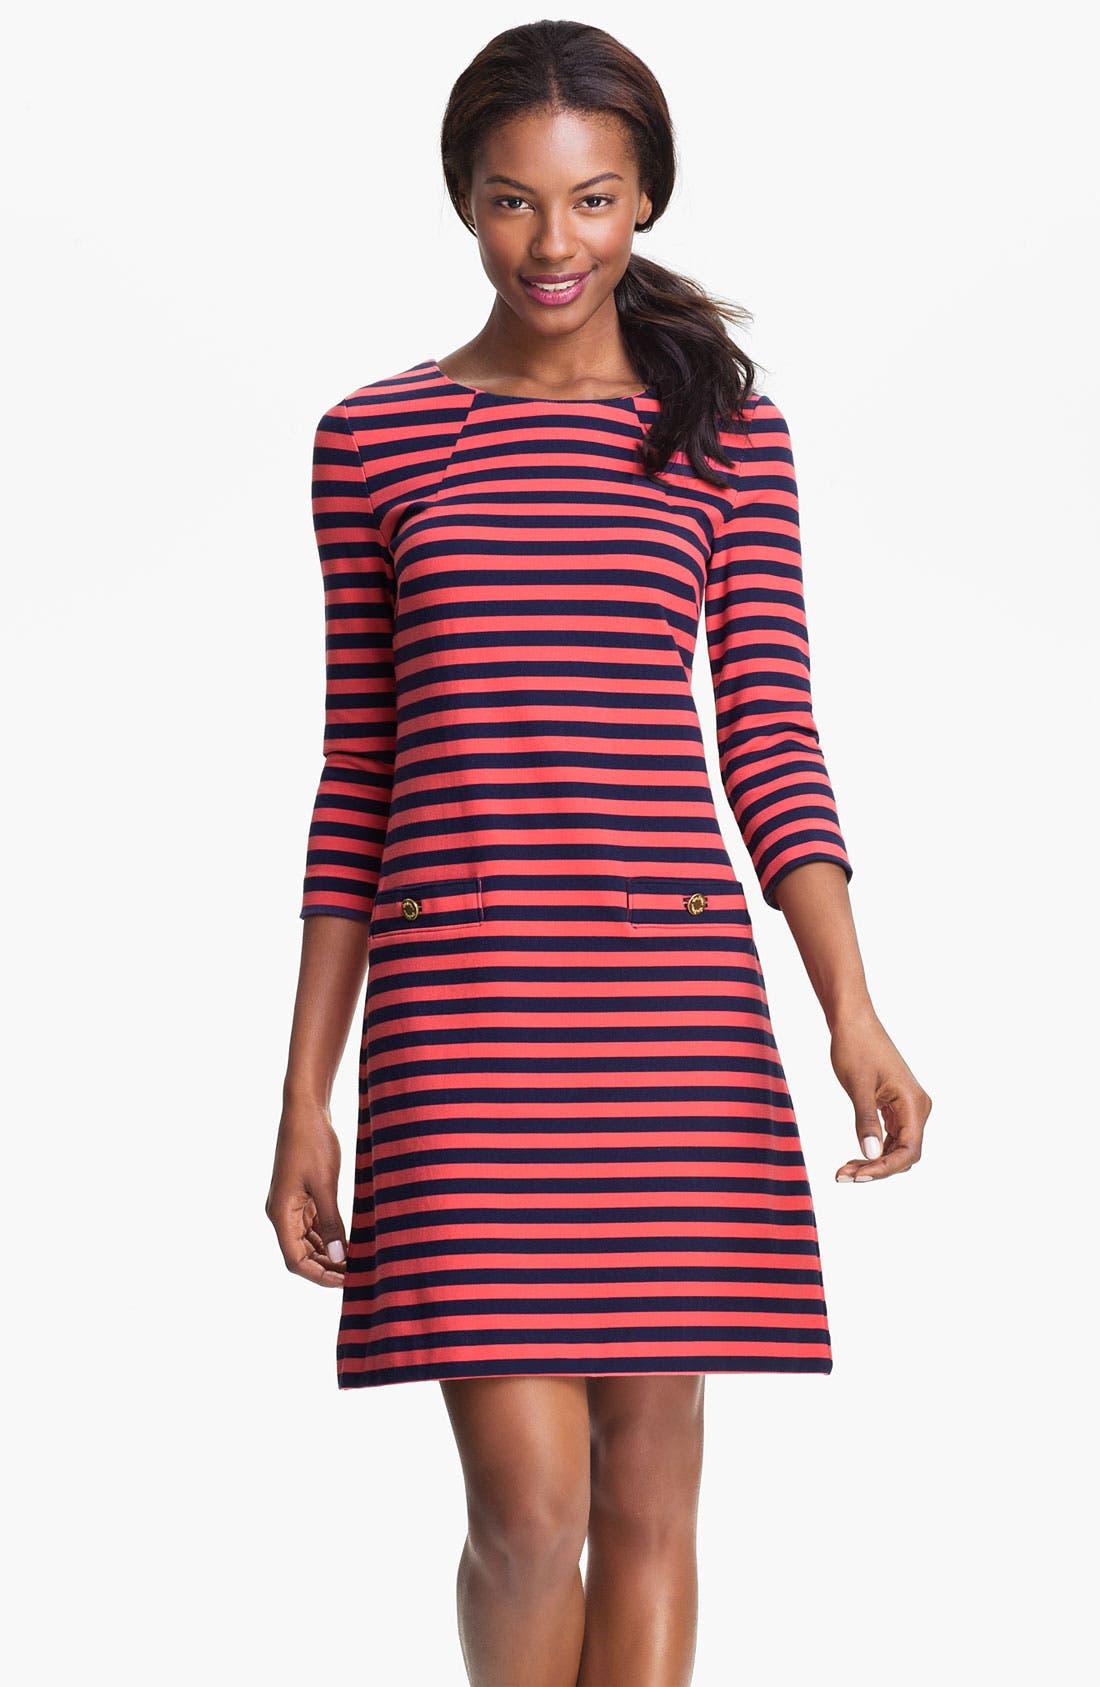 Main Image - Lilly Pulitzer® 'Charlene' Stripe Knit Shift Dress